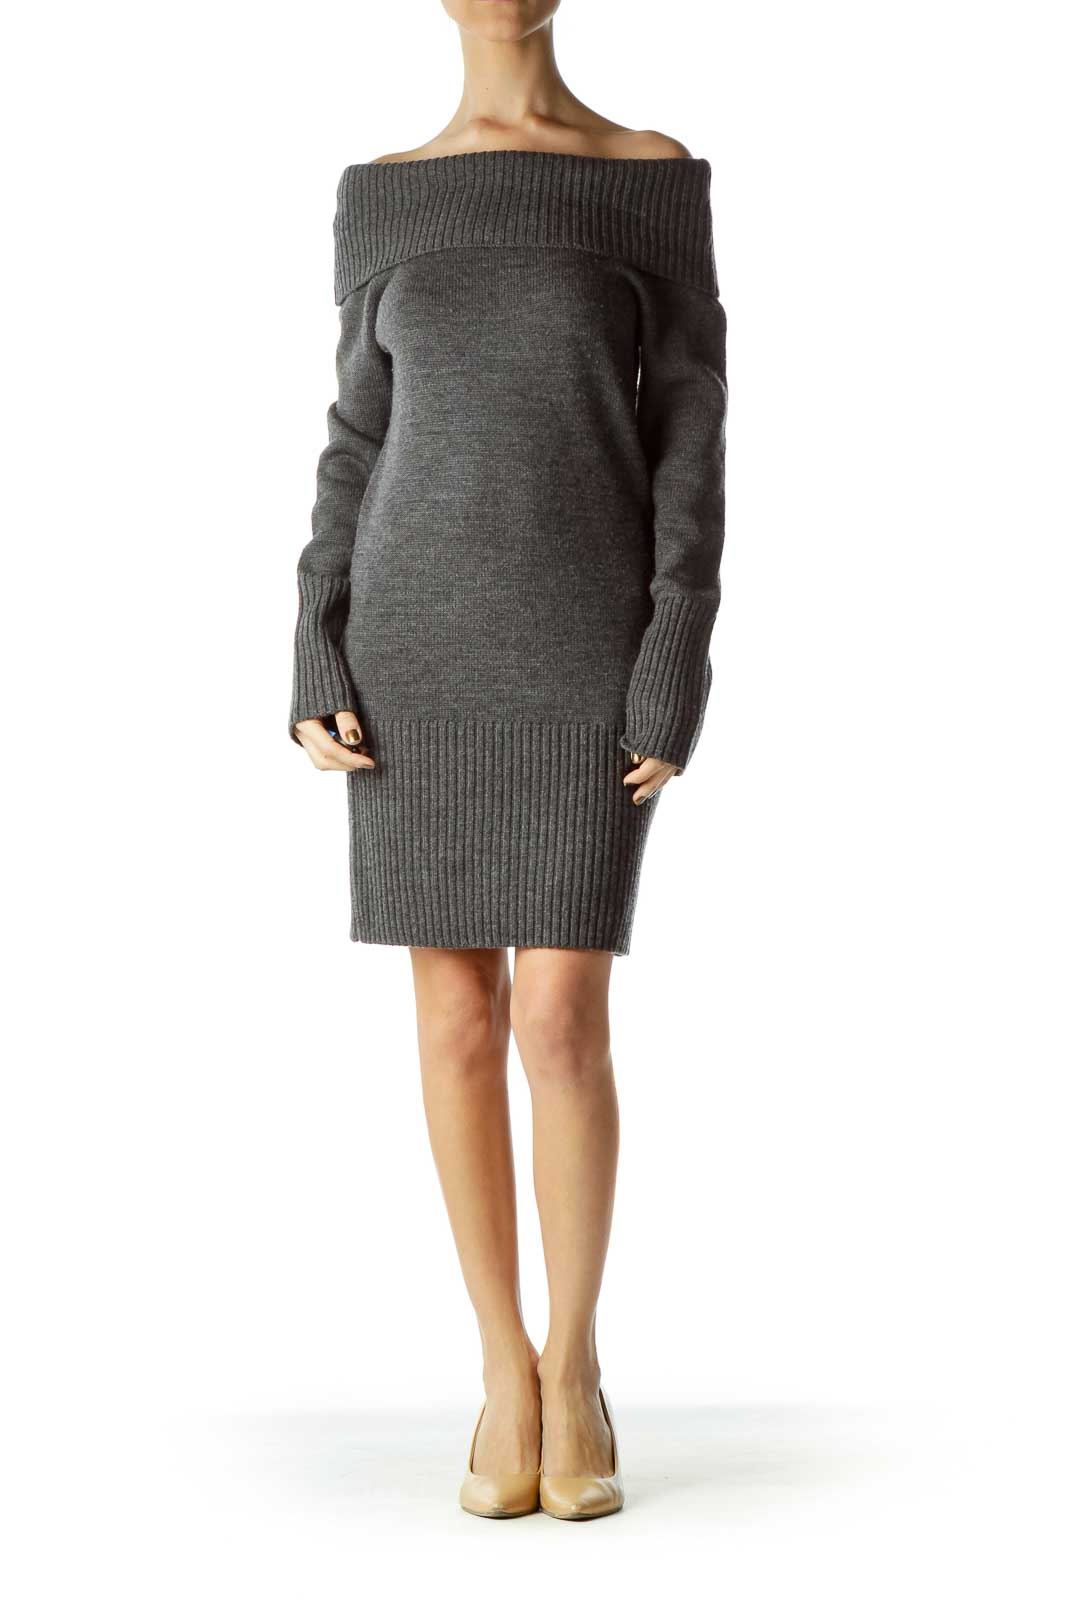 Gray Cowl Neck Knit Dress